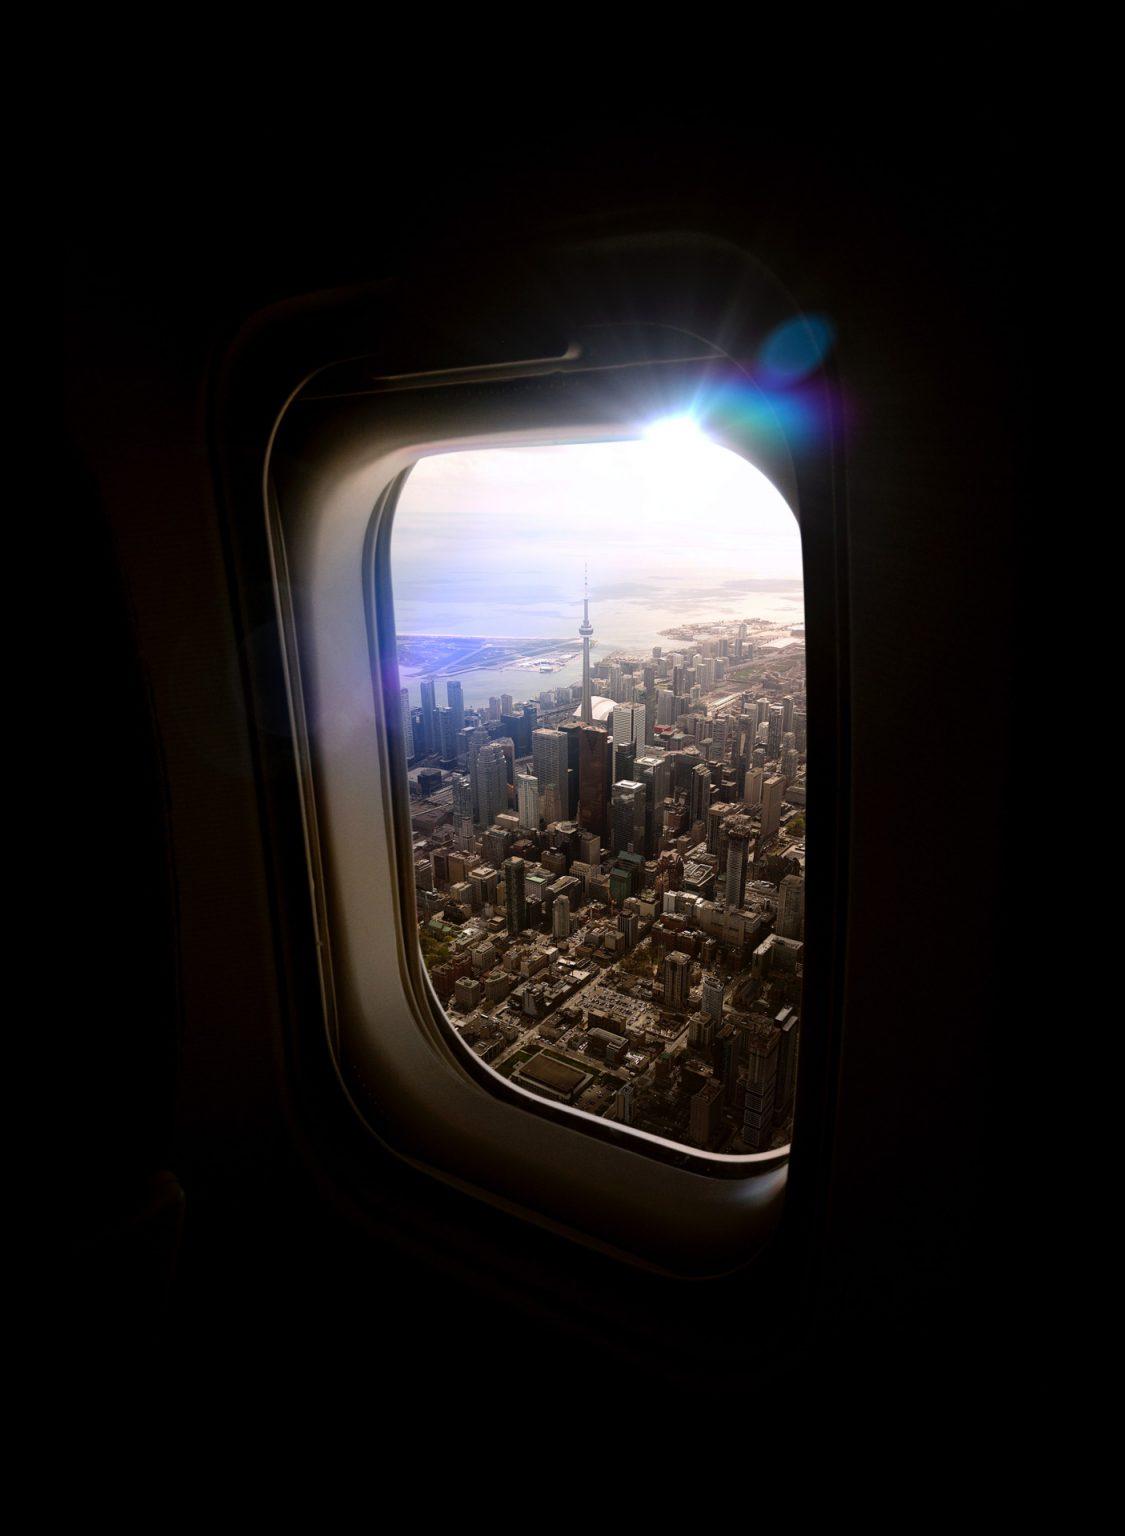 Aerial view of Downtown Toronto through an airplane window.